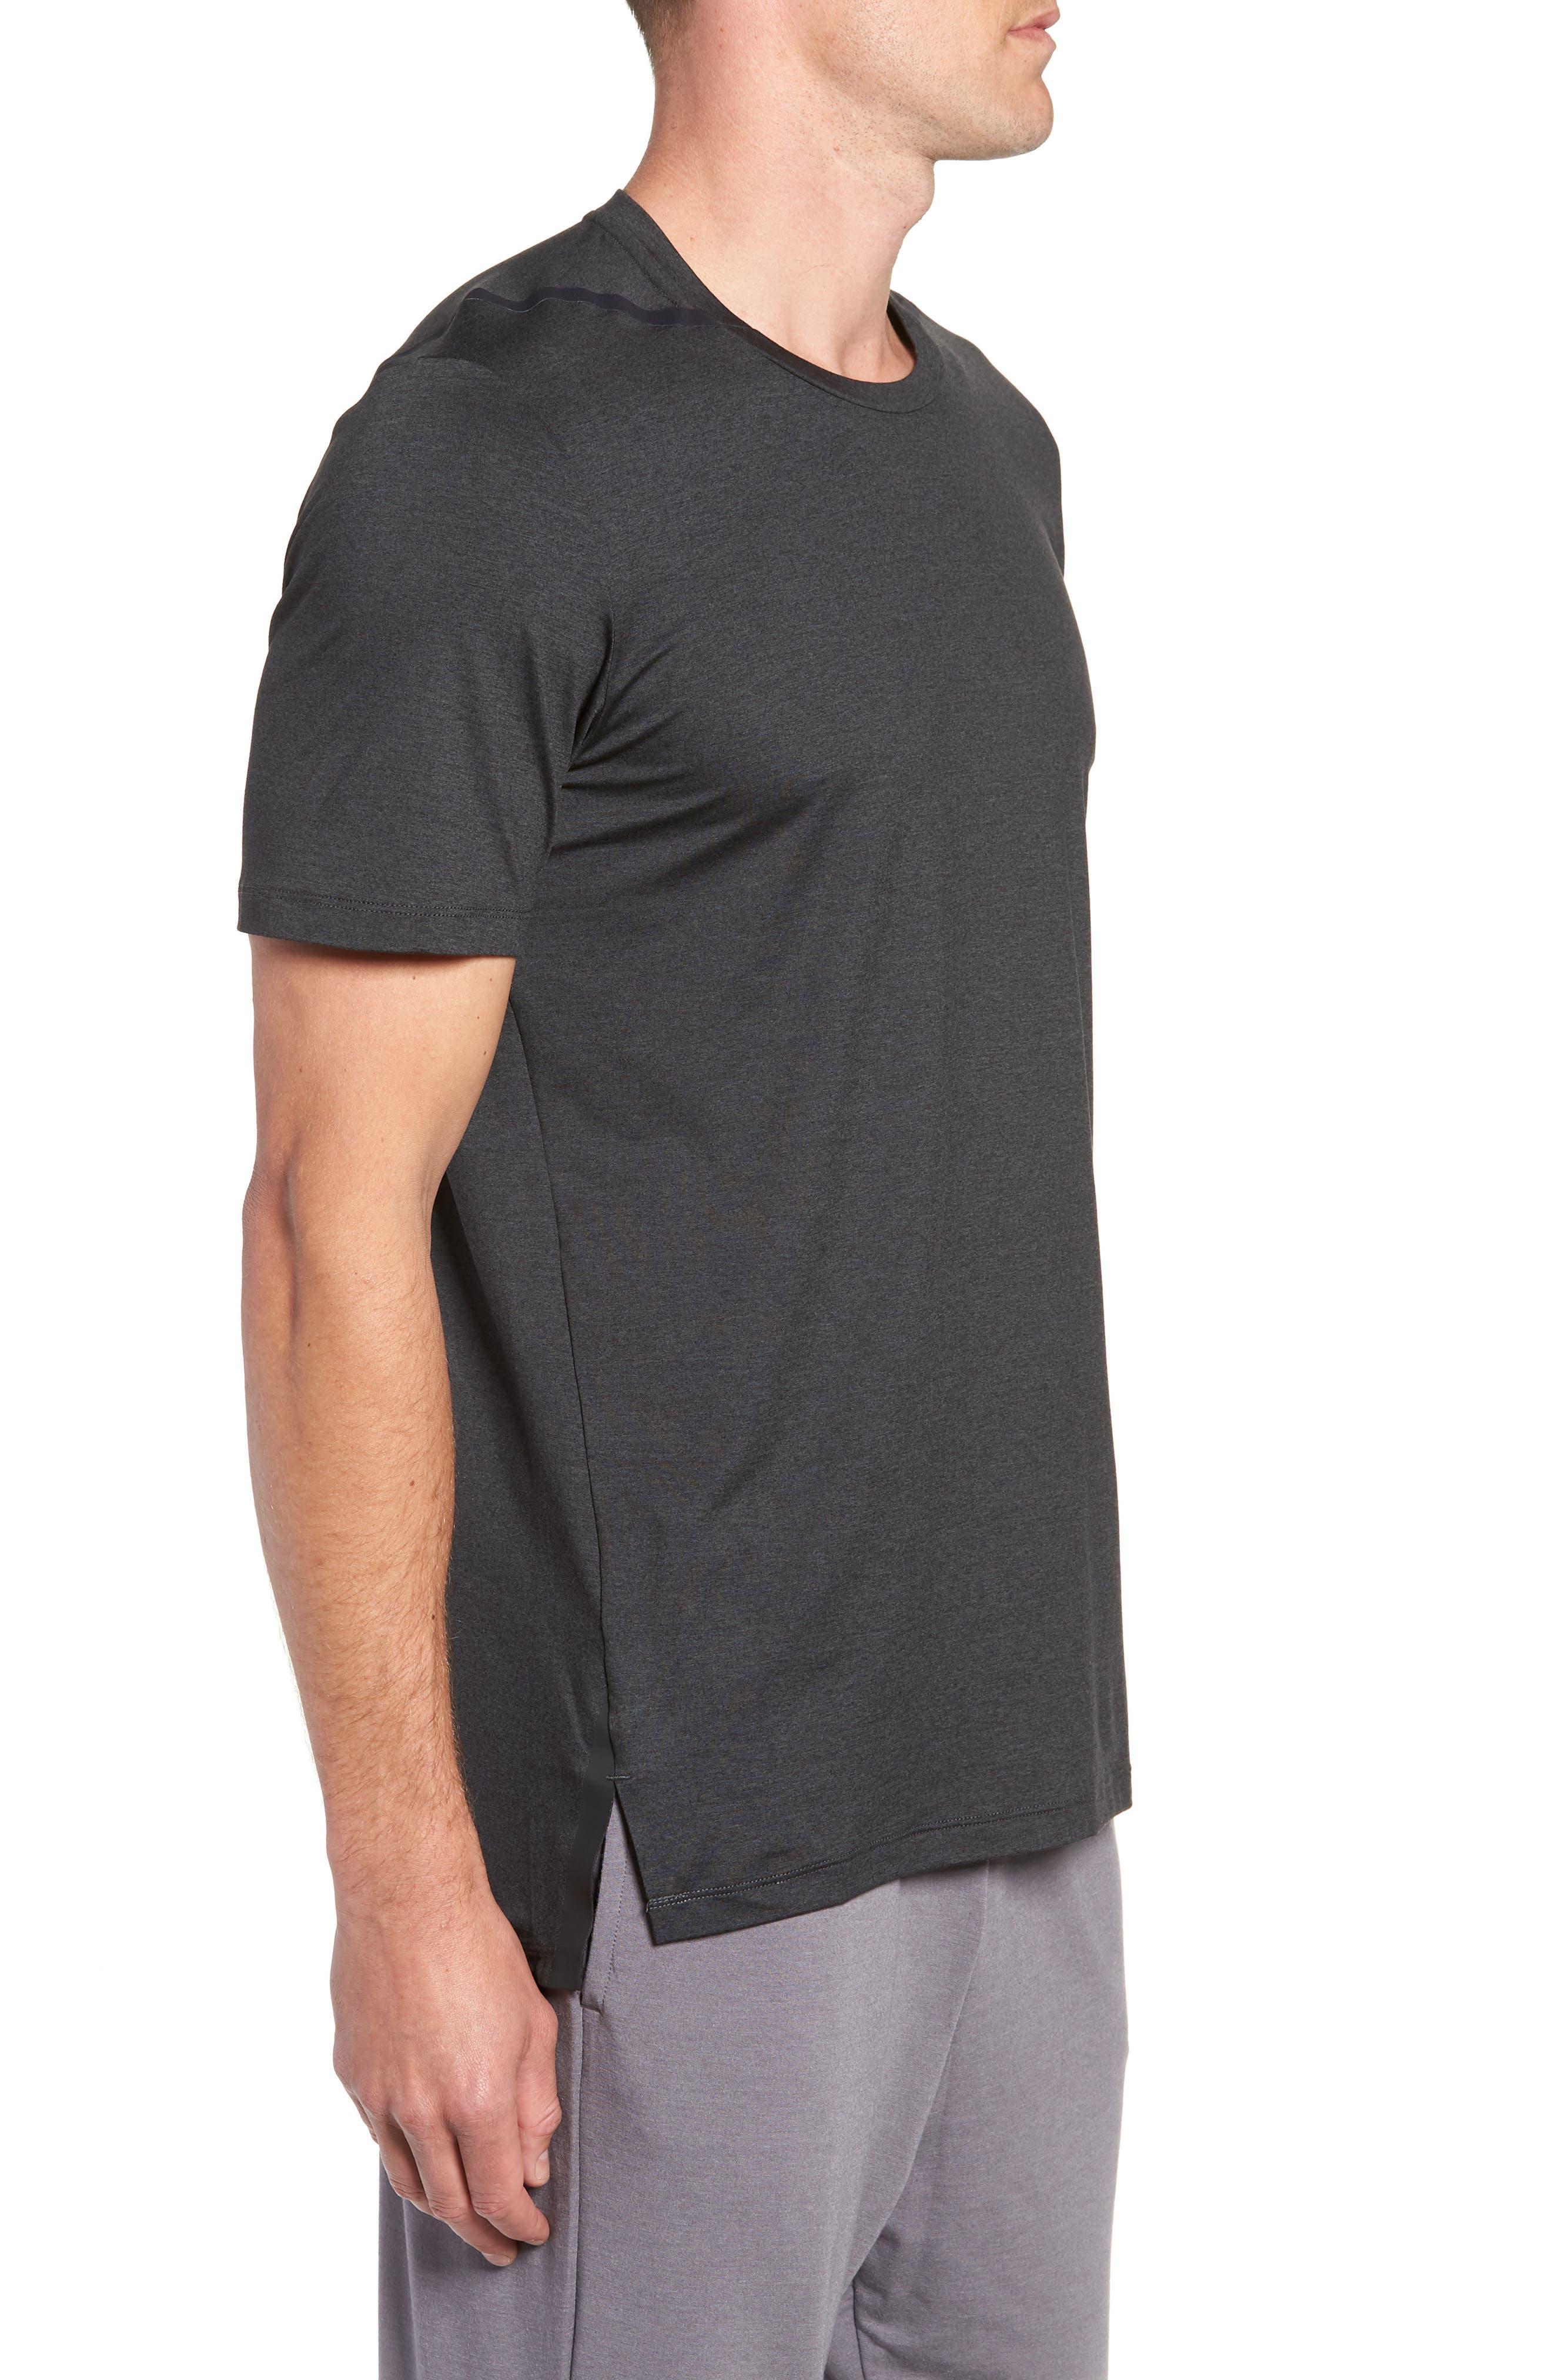 Dry Max Training T-Shirt,                             Alternate thumbnail 3, color,                             BLACK/ ANTHRACITE/ COBALT